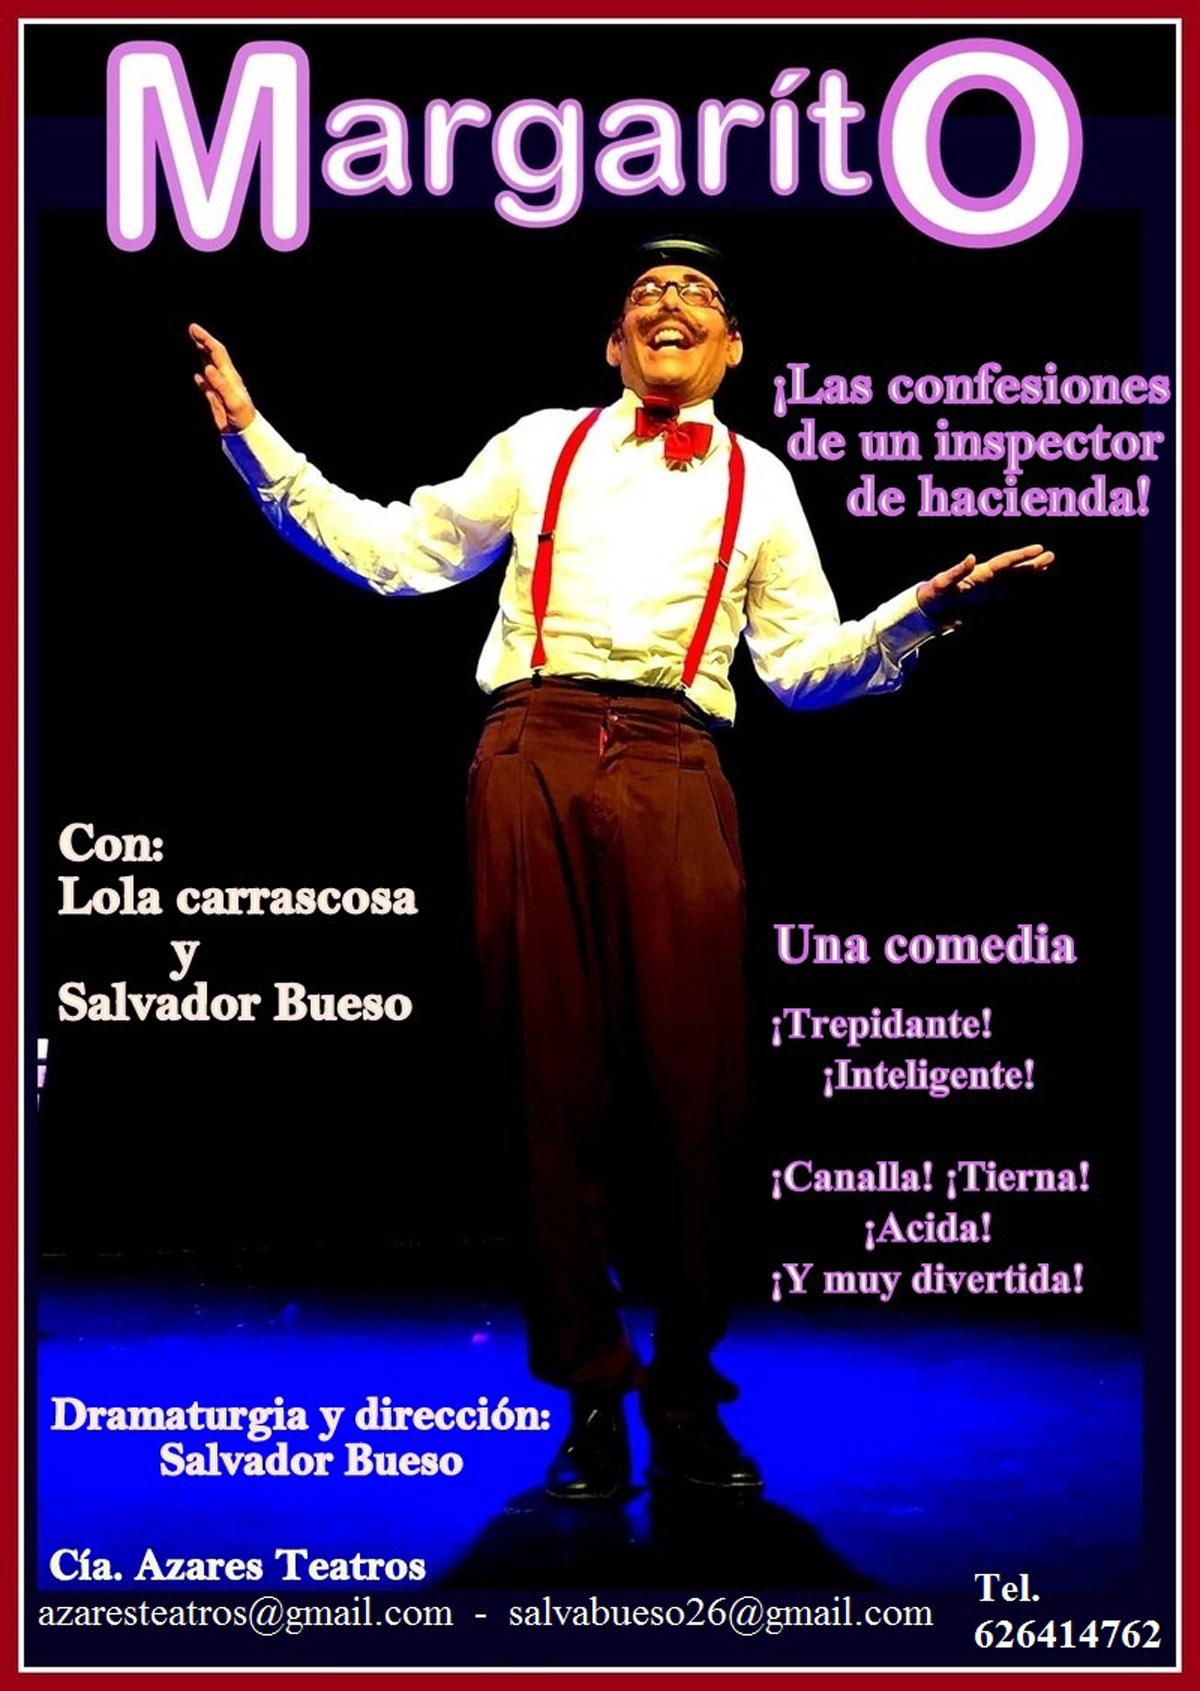 Margarito Compañía Azares Teatros